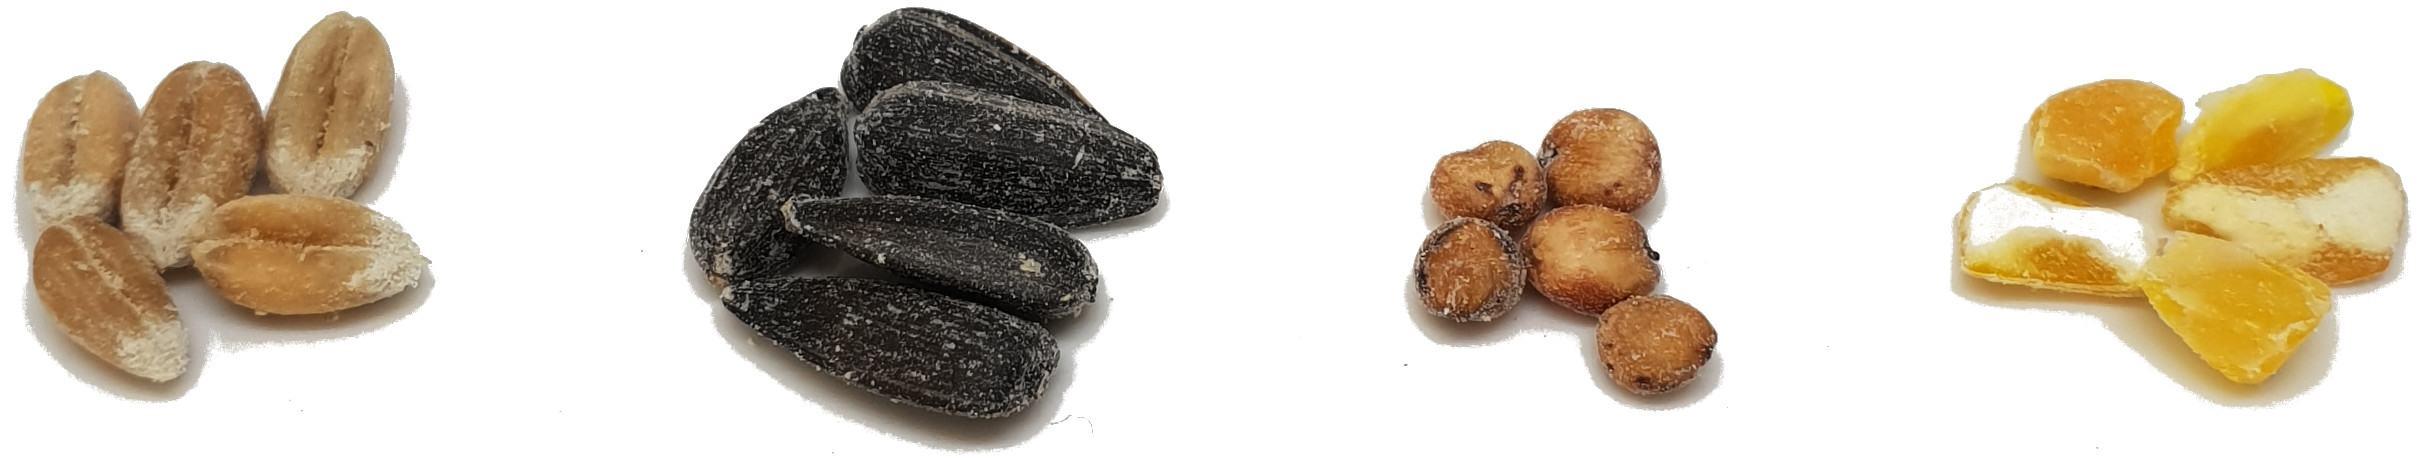 Different Types Of Grain Spawn For Mushroom Growing   Mushroom Blogs   Mushroom Growing   Mushroom Tips   Mushroom Business